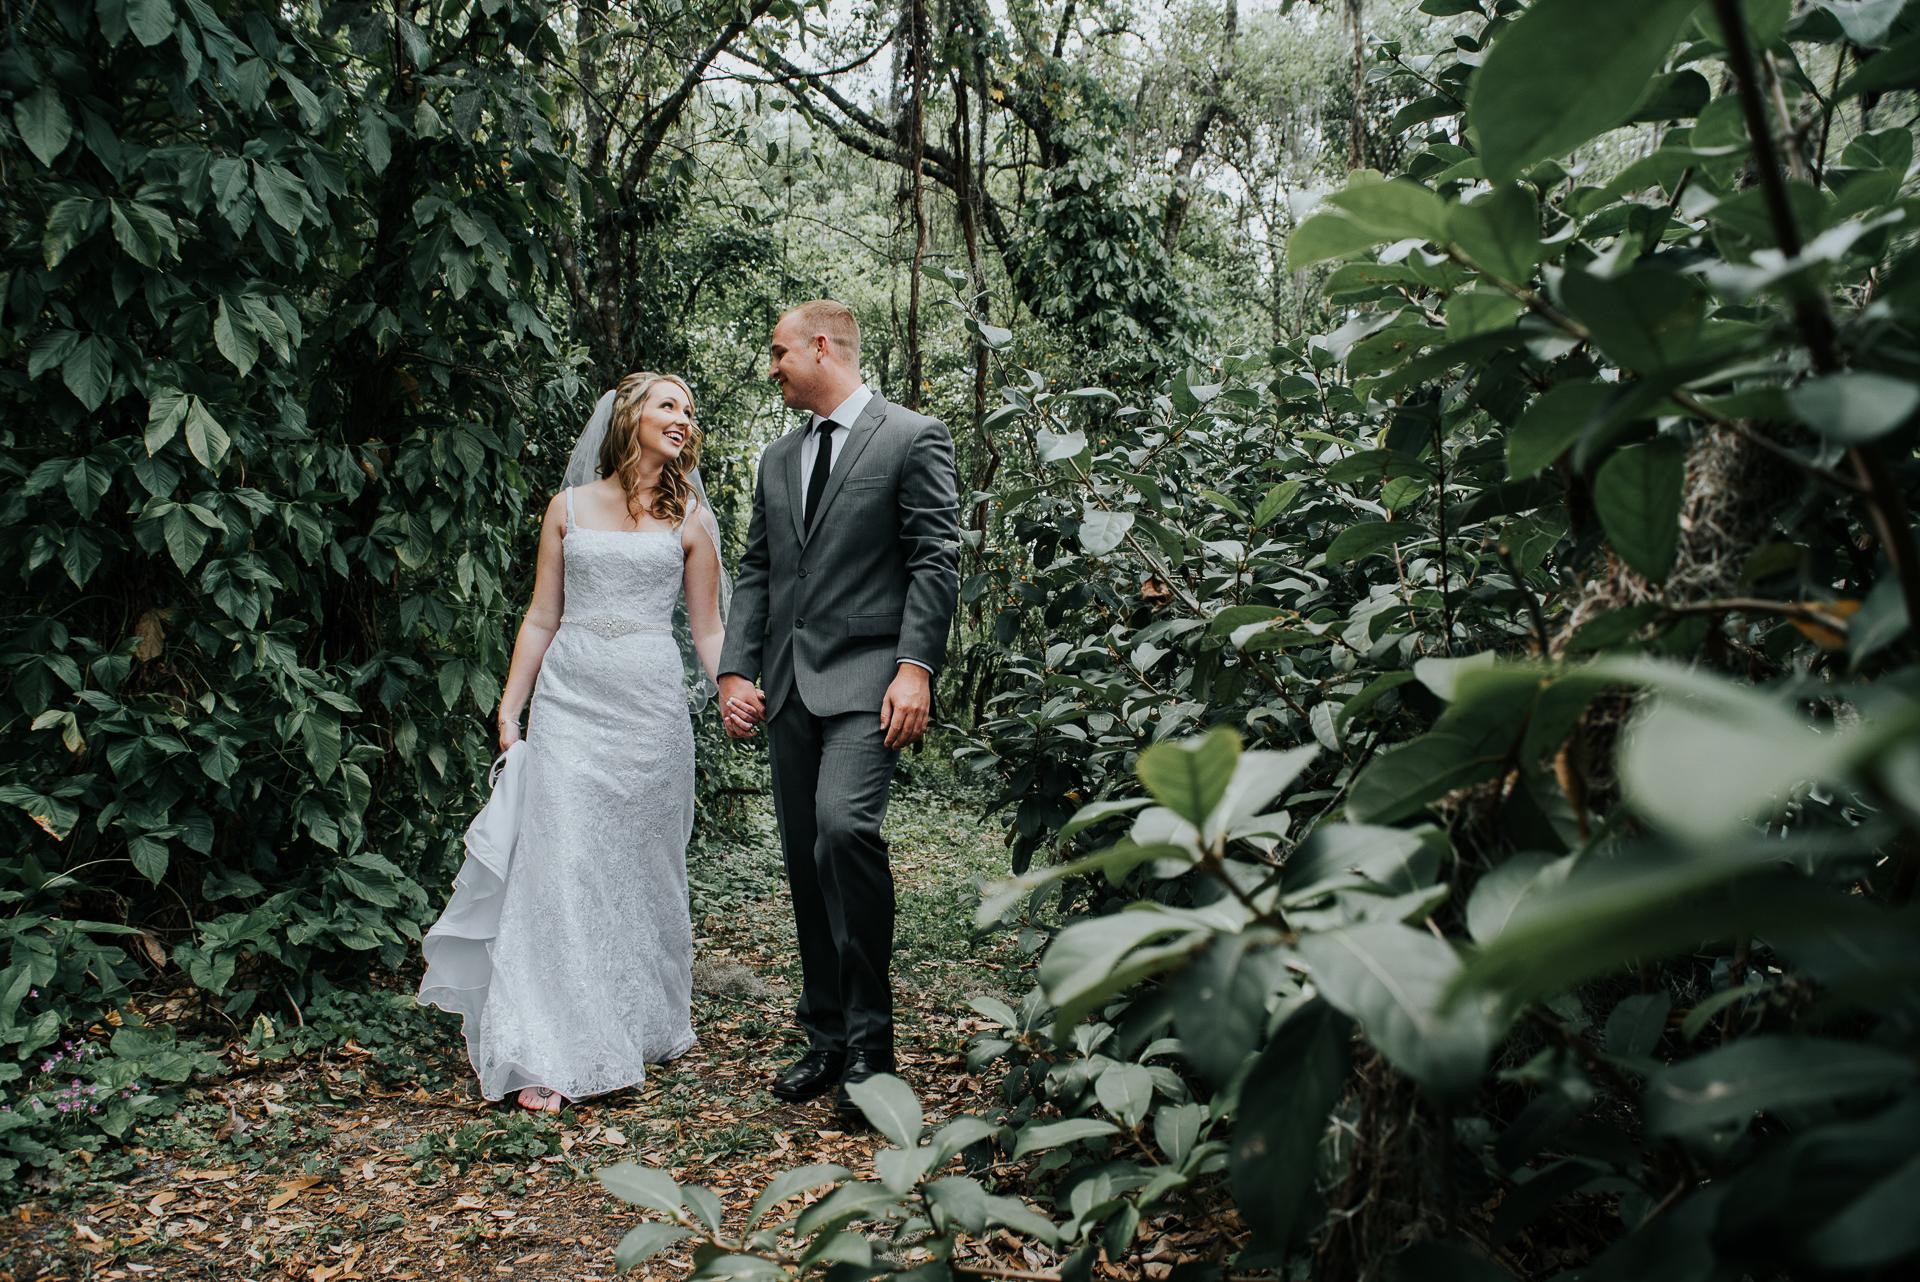 florida wedding photography - loveview weddings- timandkayla-7.jpg